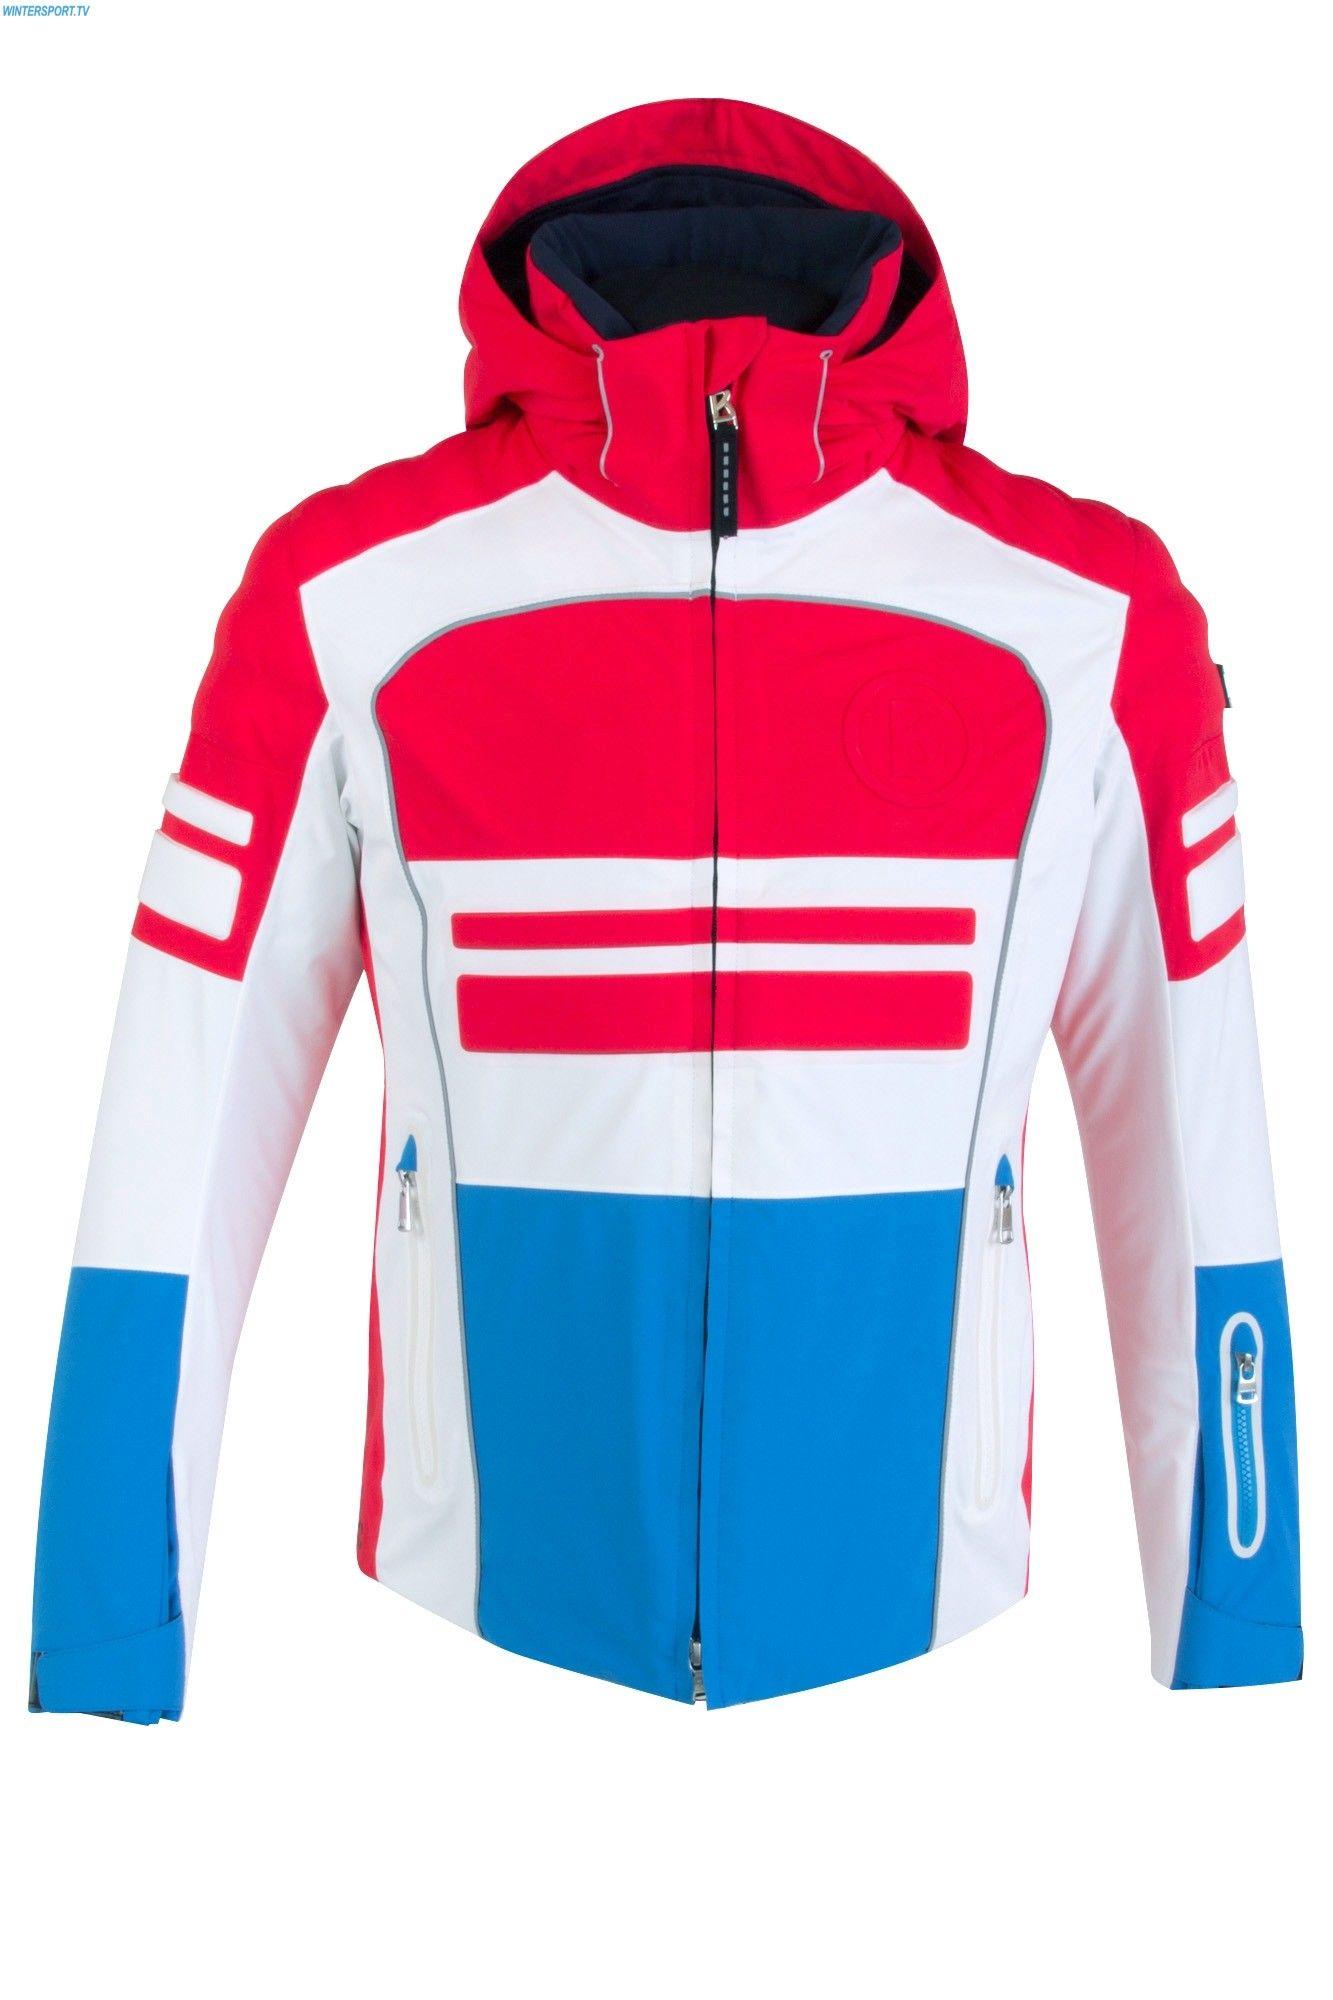 9c5196fb7f Bogner Men Race T Jacket - Hot Red Ocean Blue